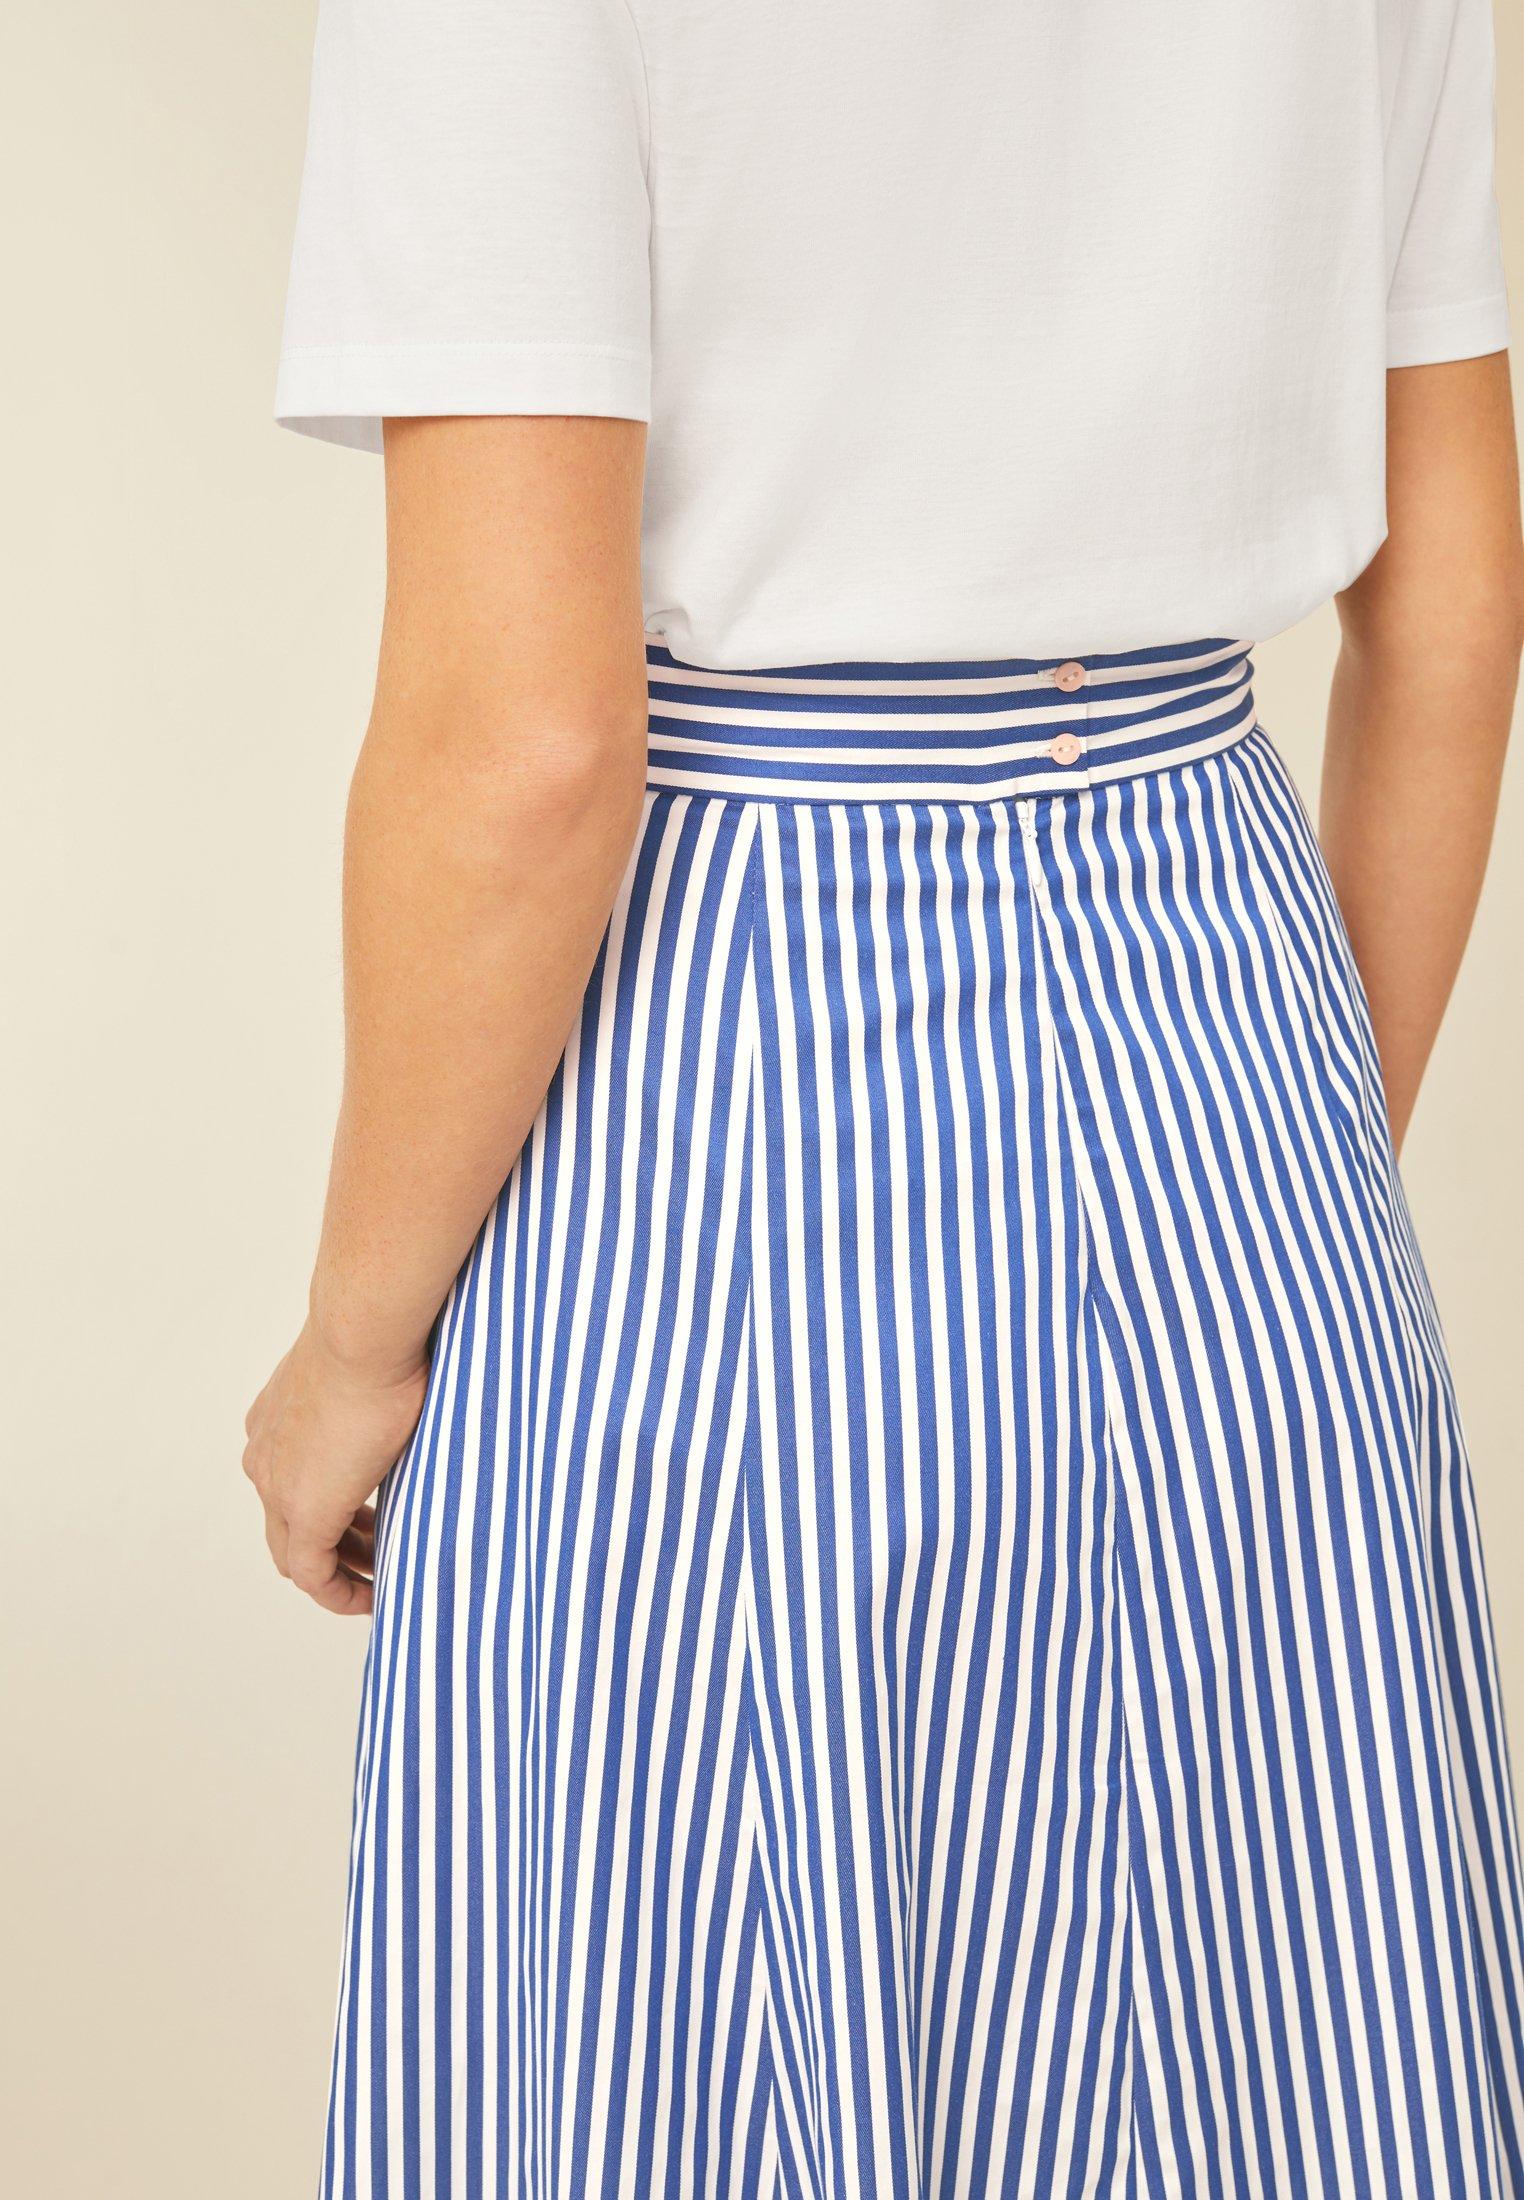 Cheapest Women's Clothing IVY & OAK STRIPED SKIRTANCLE LENGTH Maxi skirt blue 5xJeGo2ap